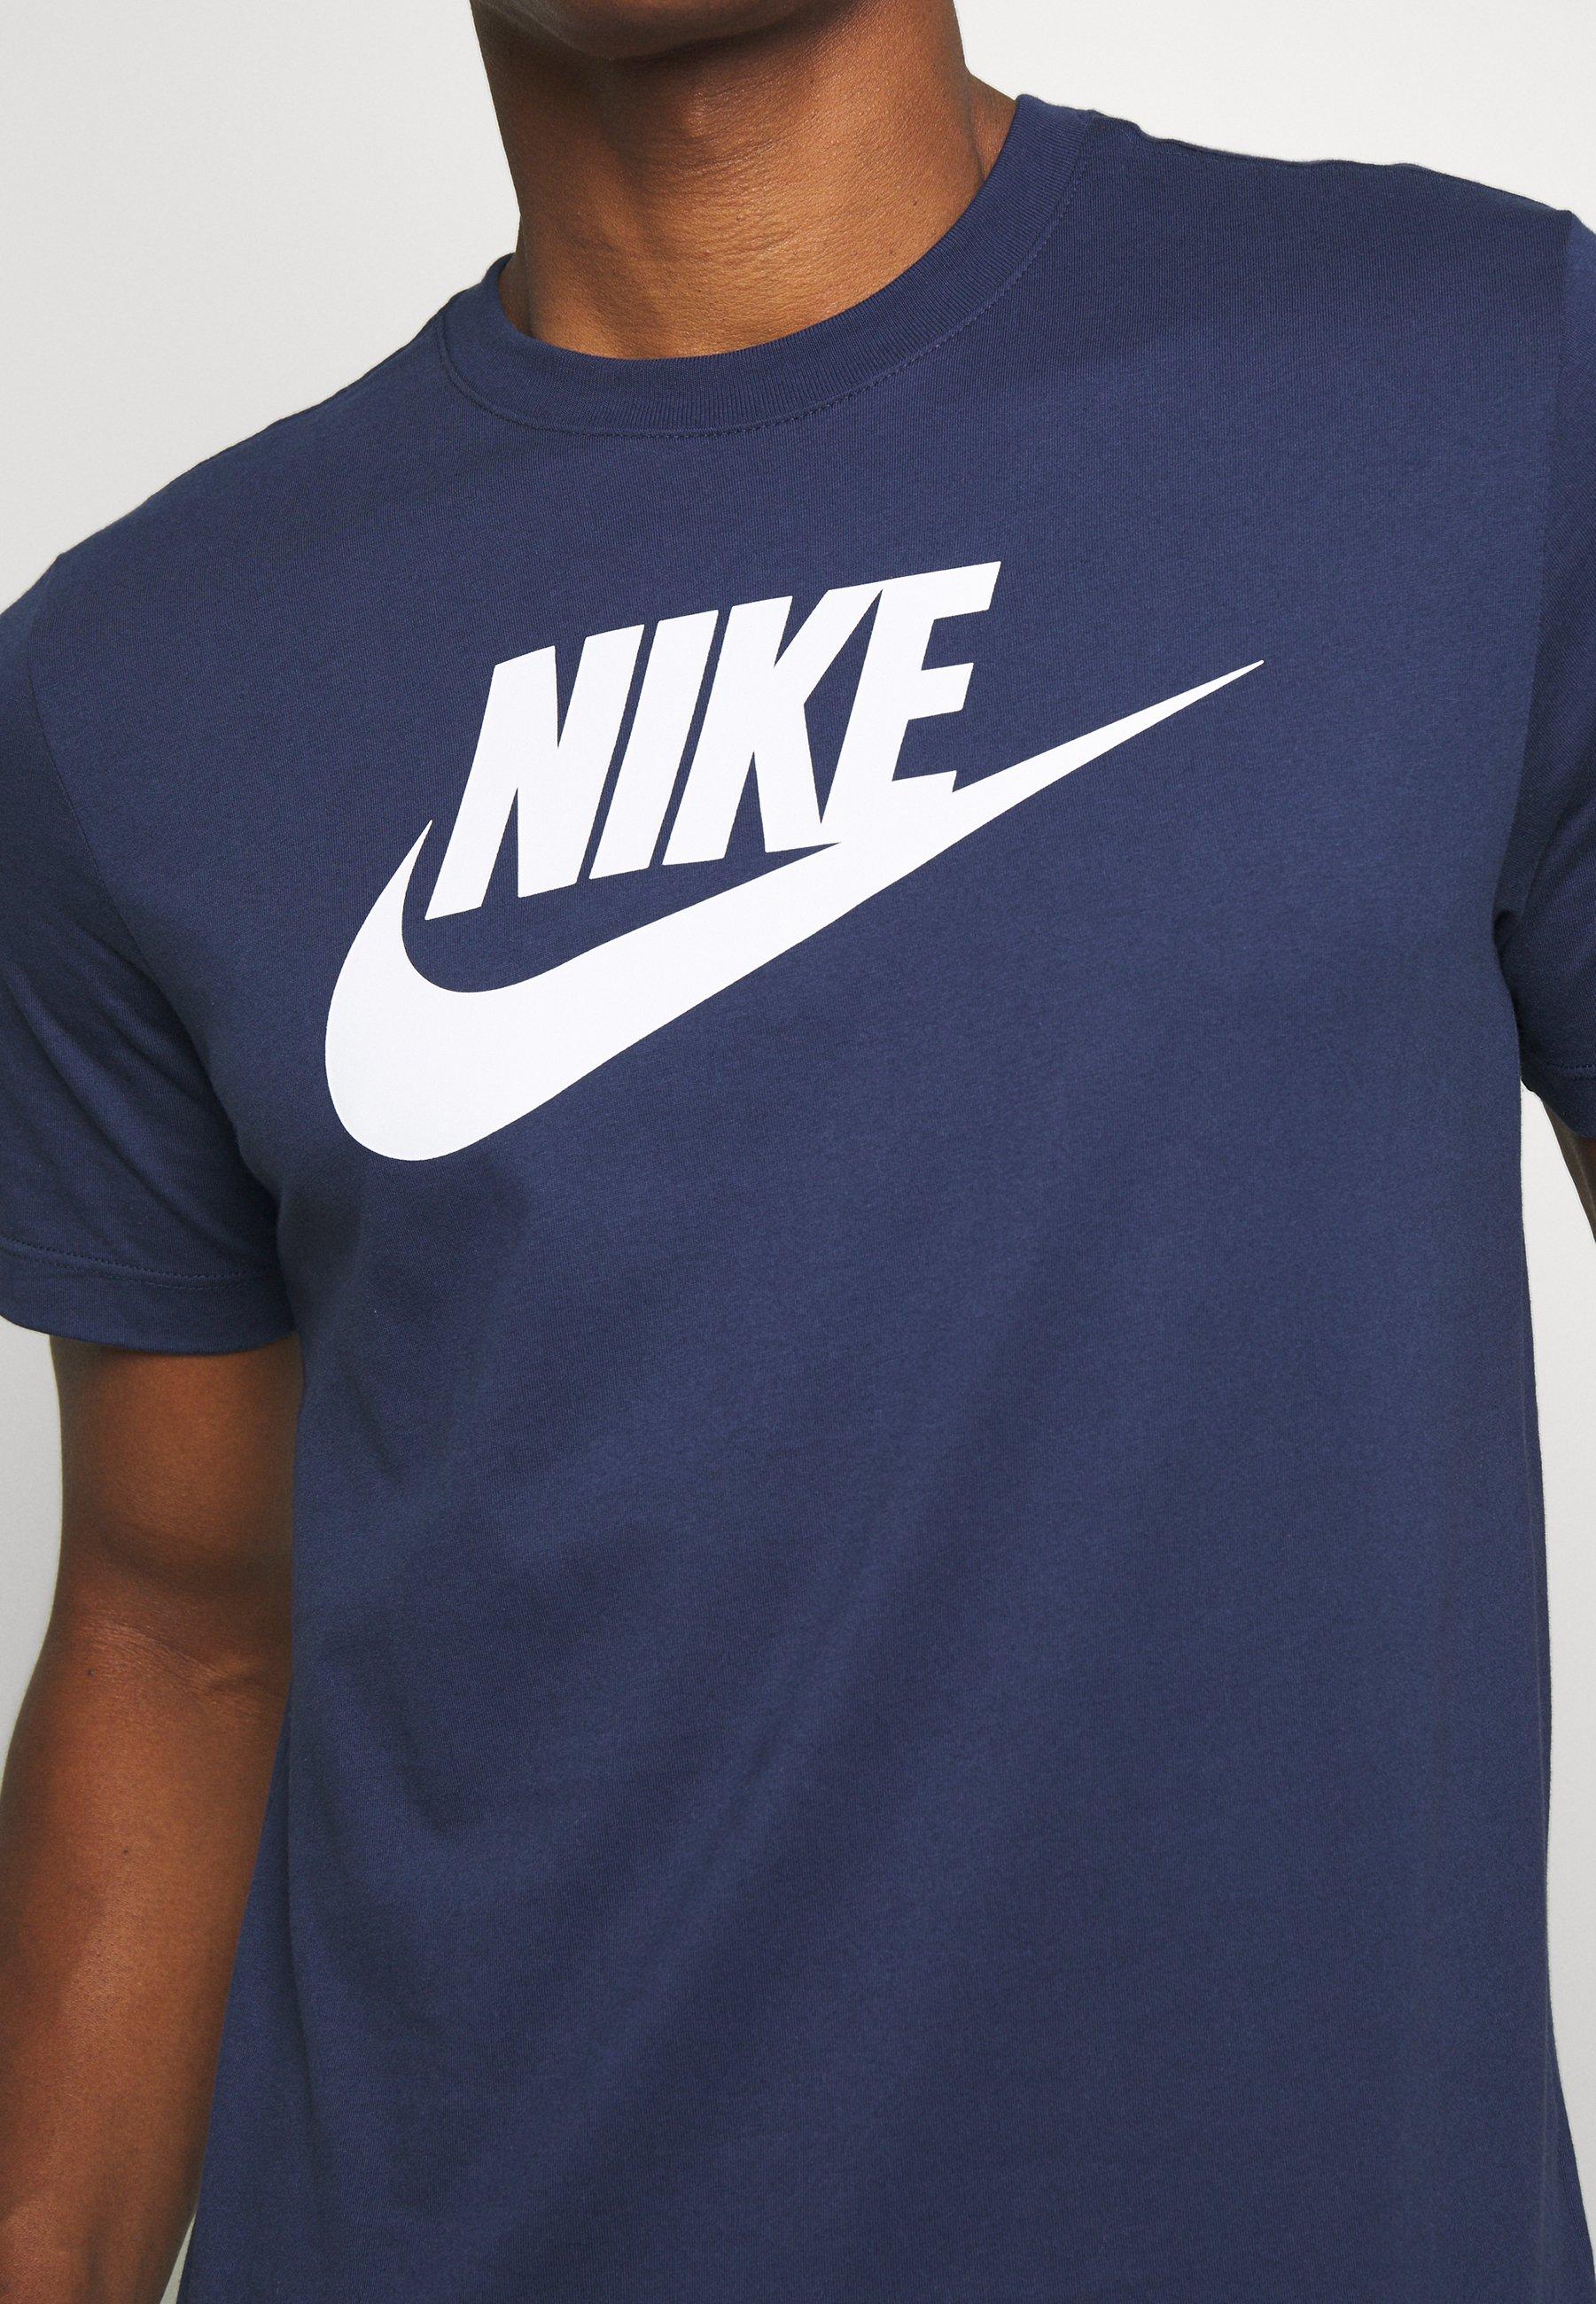 Nike Sportswear Tee Icon Futura - T-shirts Med Print Midnight Navy/white/mørkeblå